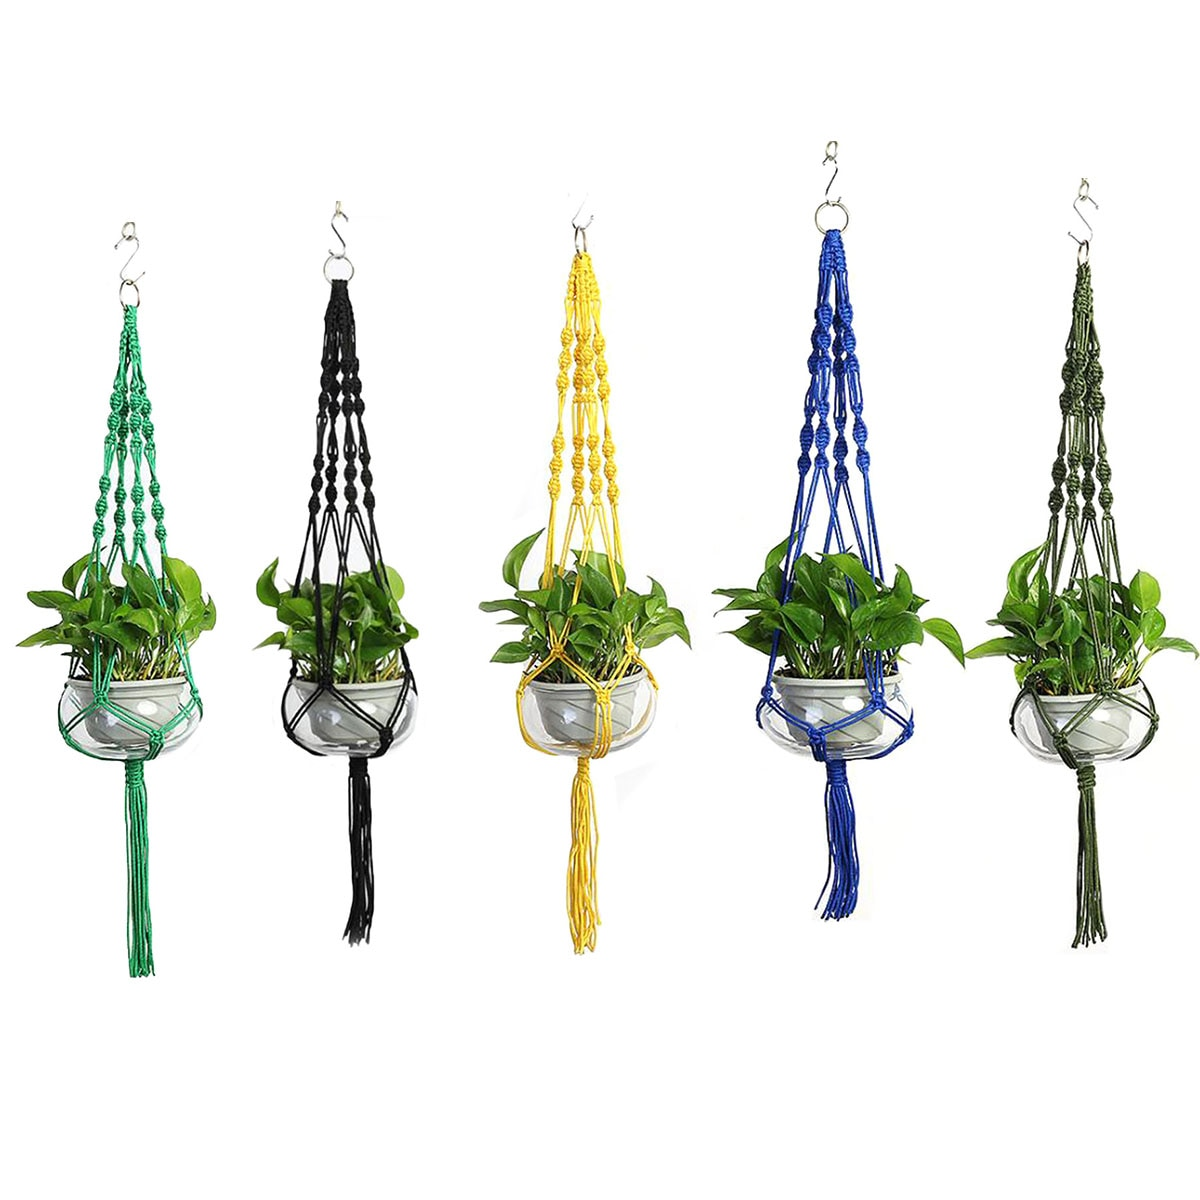 Nylon Tassel Flower Pot Net Hand-Woven Multicolor Wall Hanging Planter Basket Suitable for Indoor Outdoor Decoration